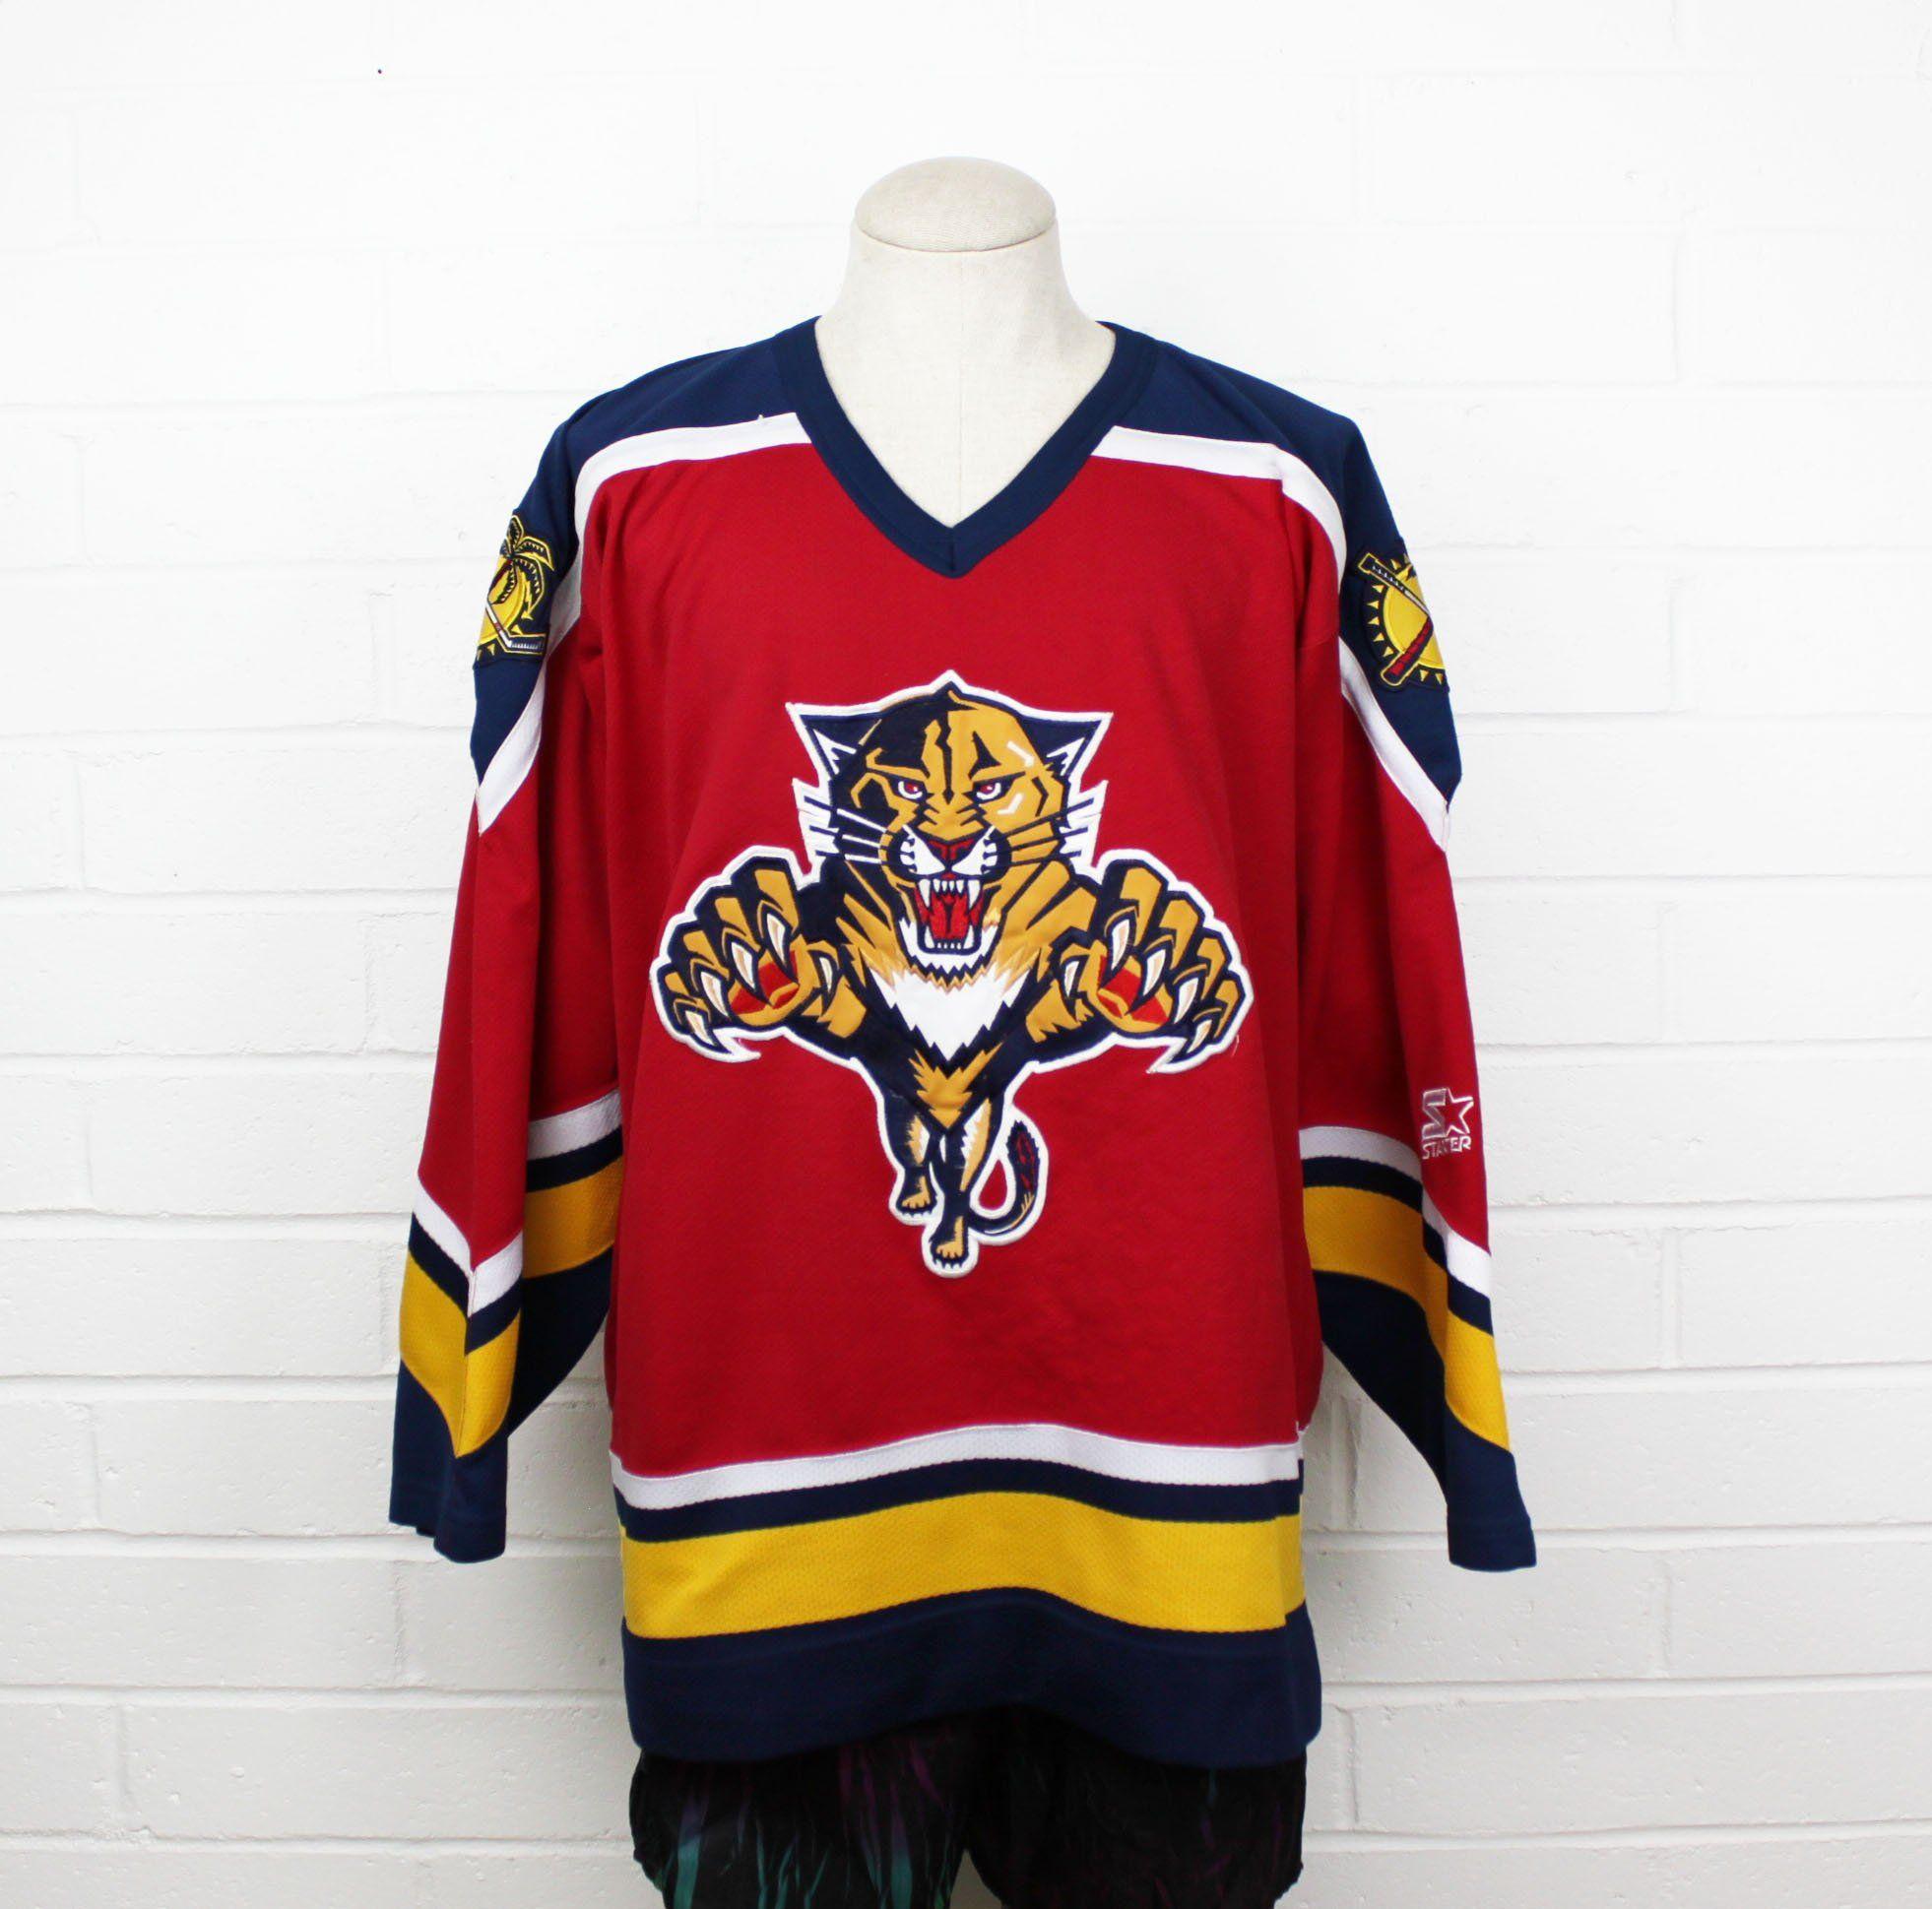 sports shoes e5209 1468b Vintage 90s Florida Panthers Hockey Jersey by Starter large ...